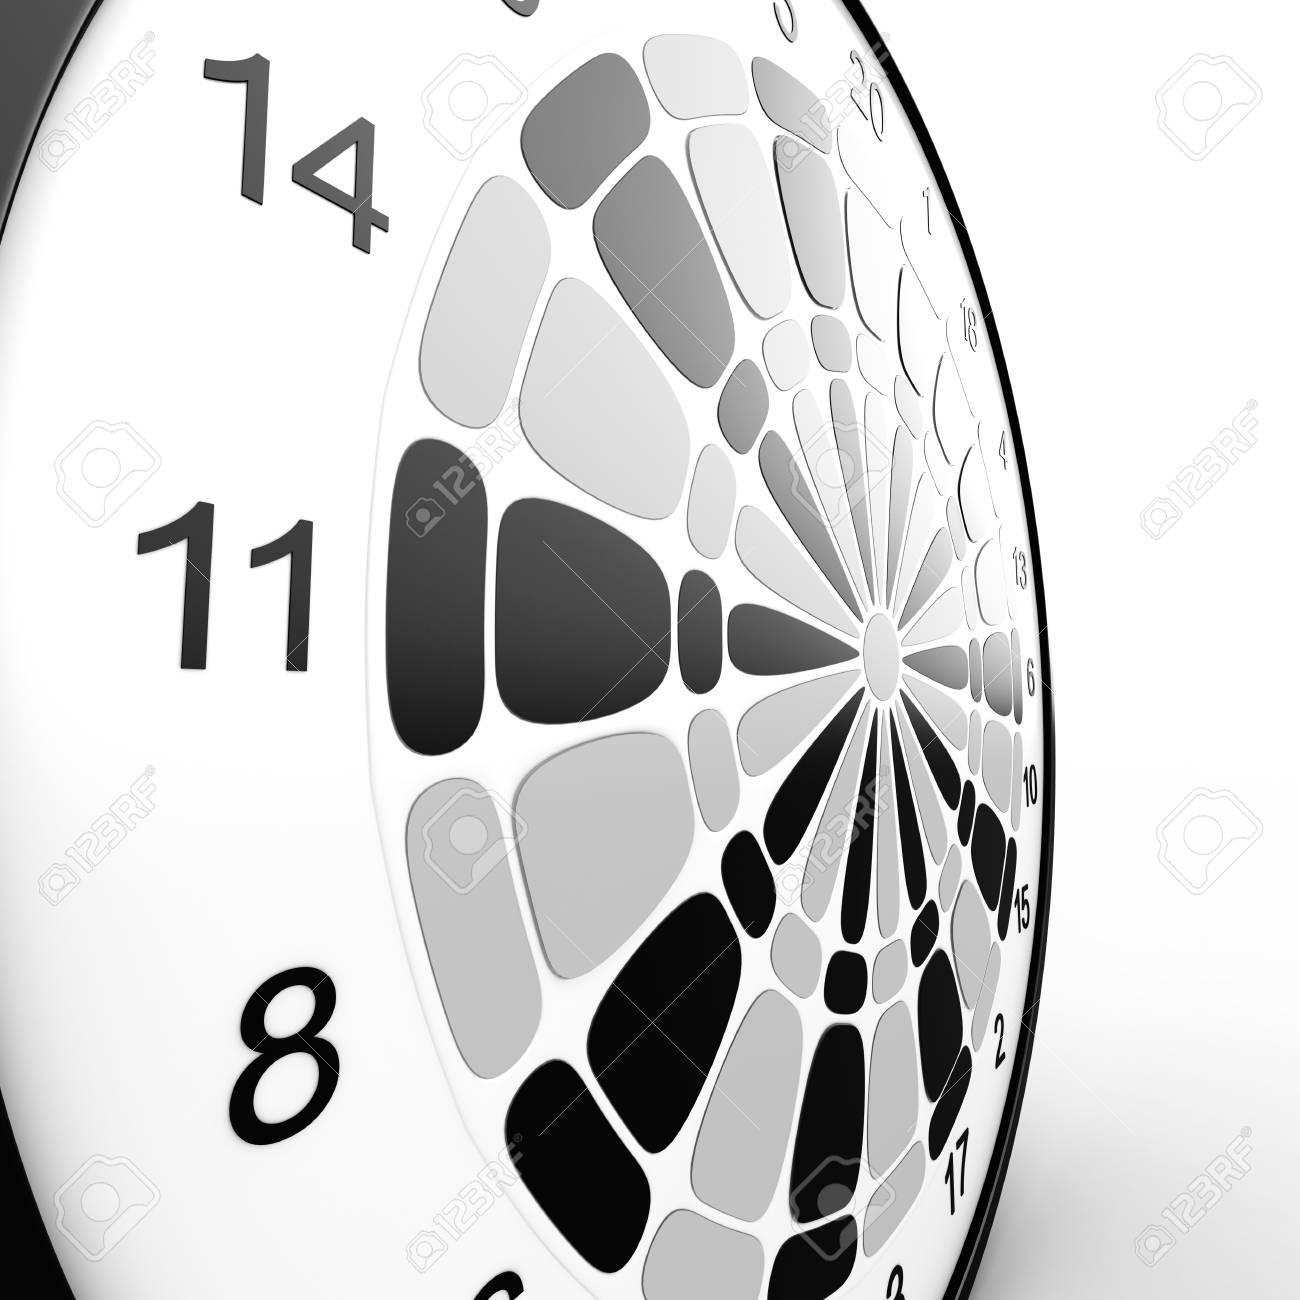 Dart Board  3D rendered illustration over white background Stock Photo - 13125939